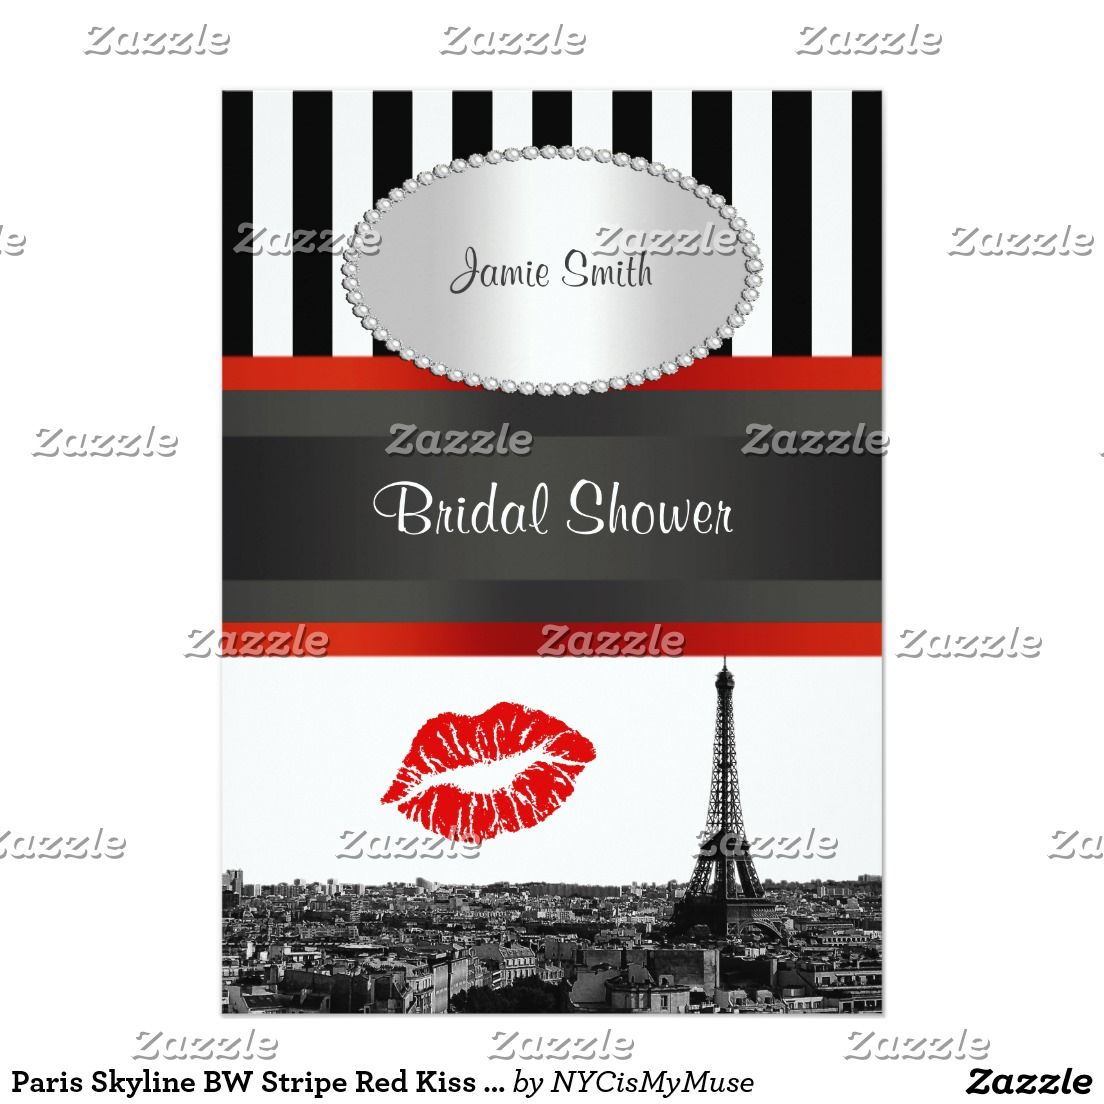 Paris Skyline BW Stripe Red Kiss PV Bridal Shower Card | Paris ...